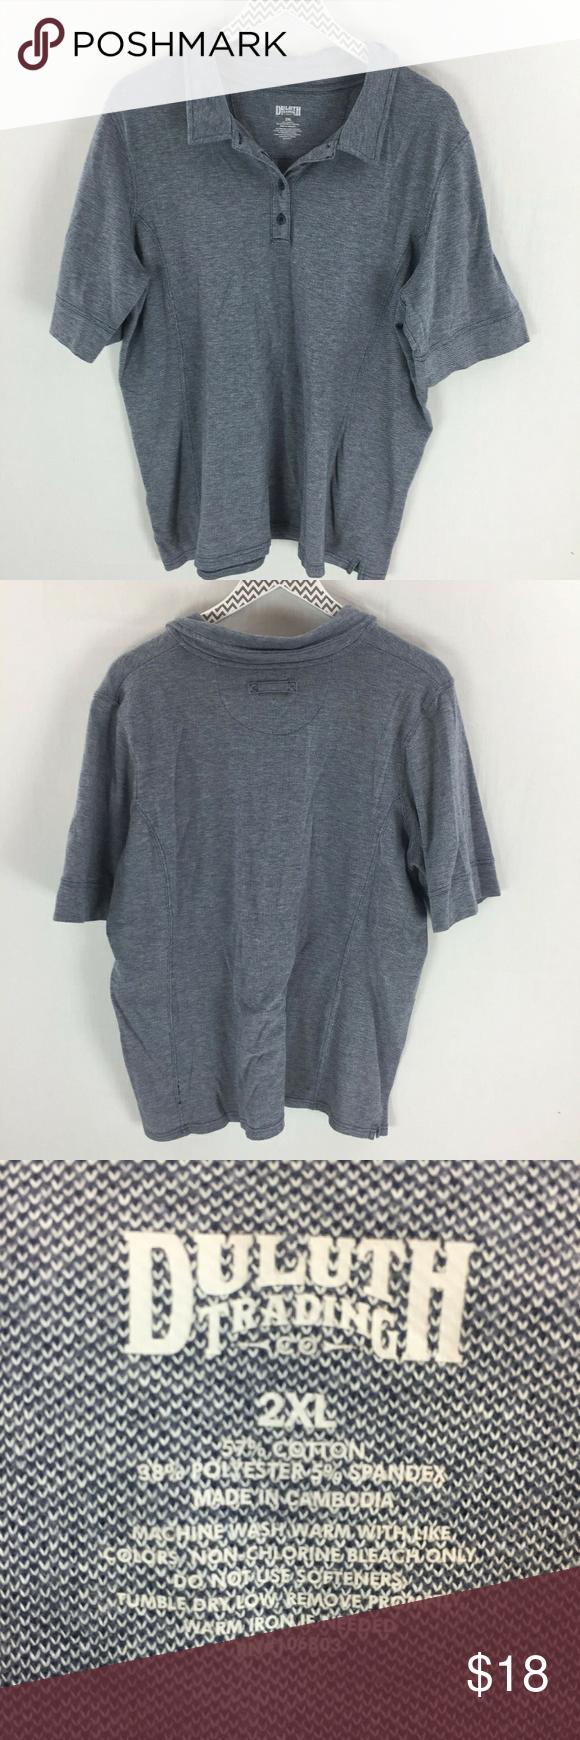 Duluth trading Co short sleeve polo shirt 2xl blue Duluth